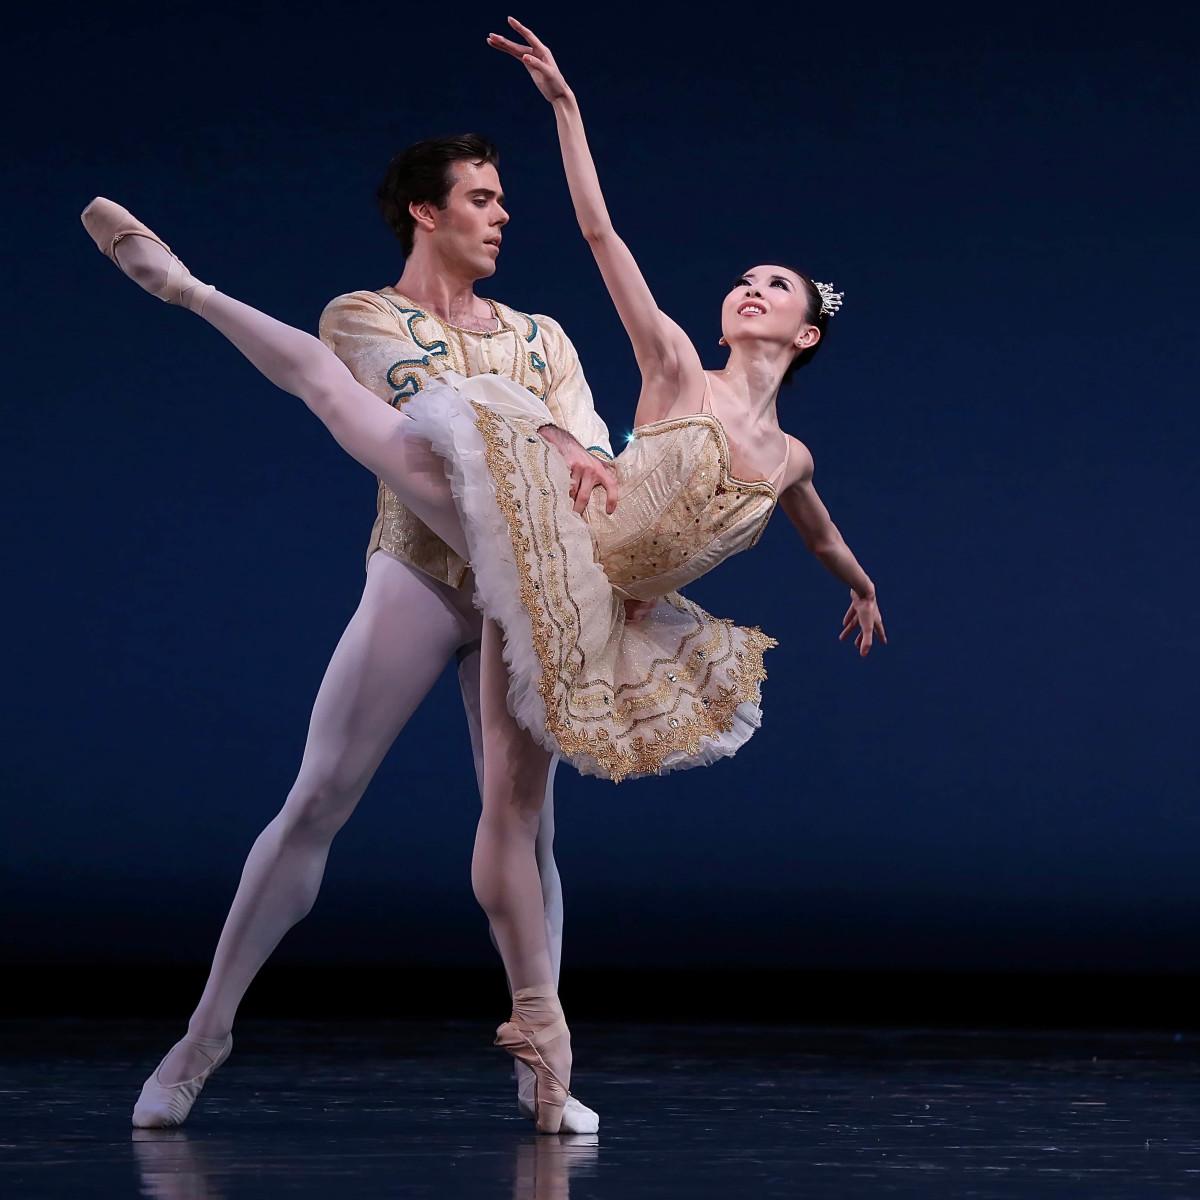 Houston Ballet, Theme and Variations, Connor Walsh, Yuriko Kajiya